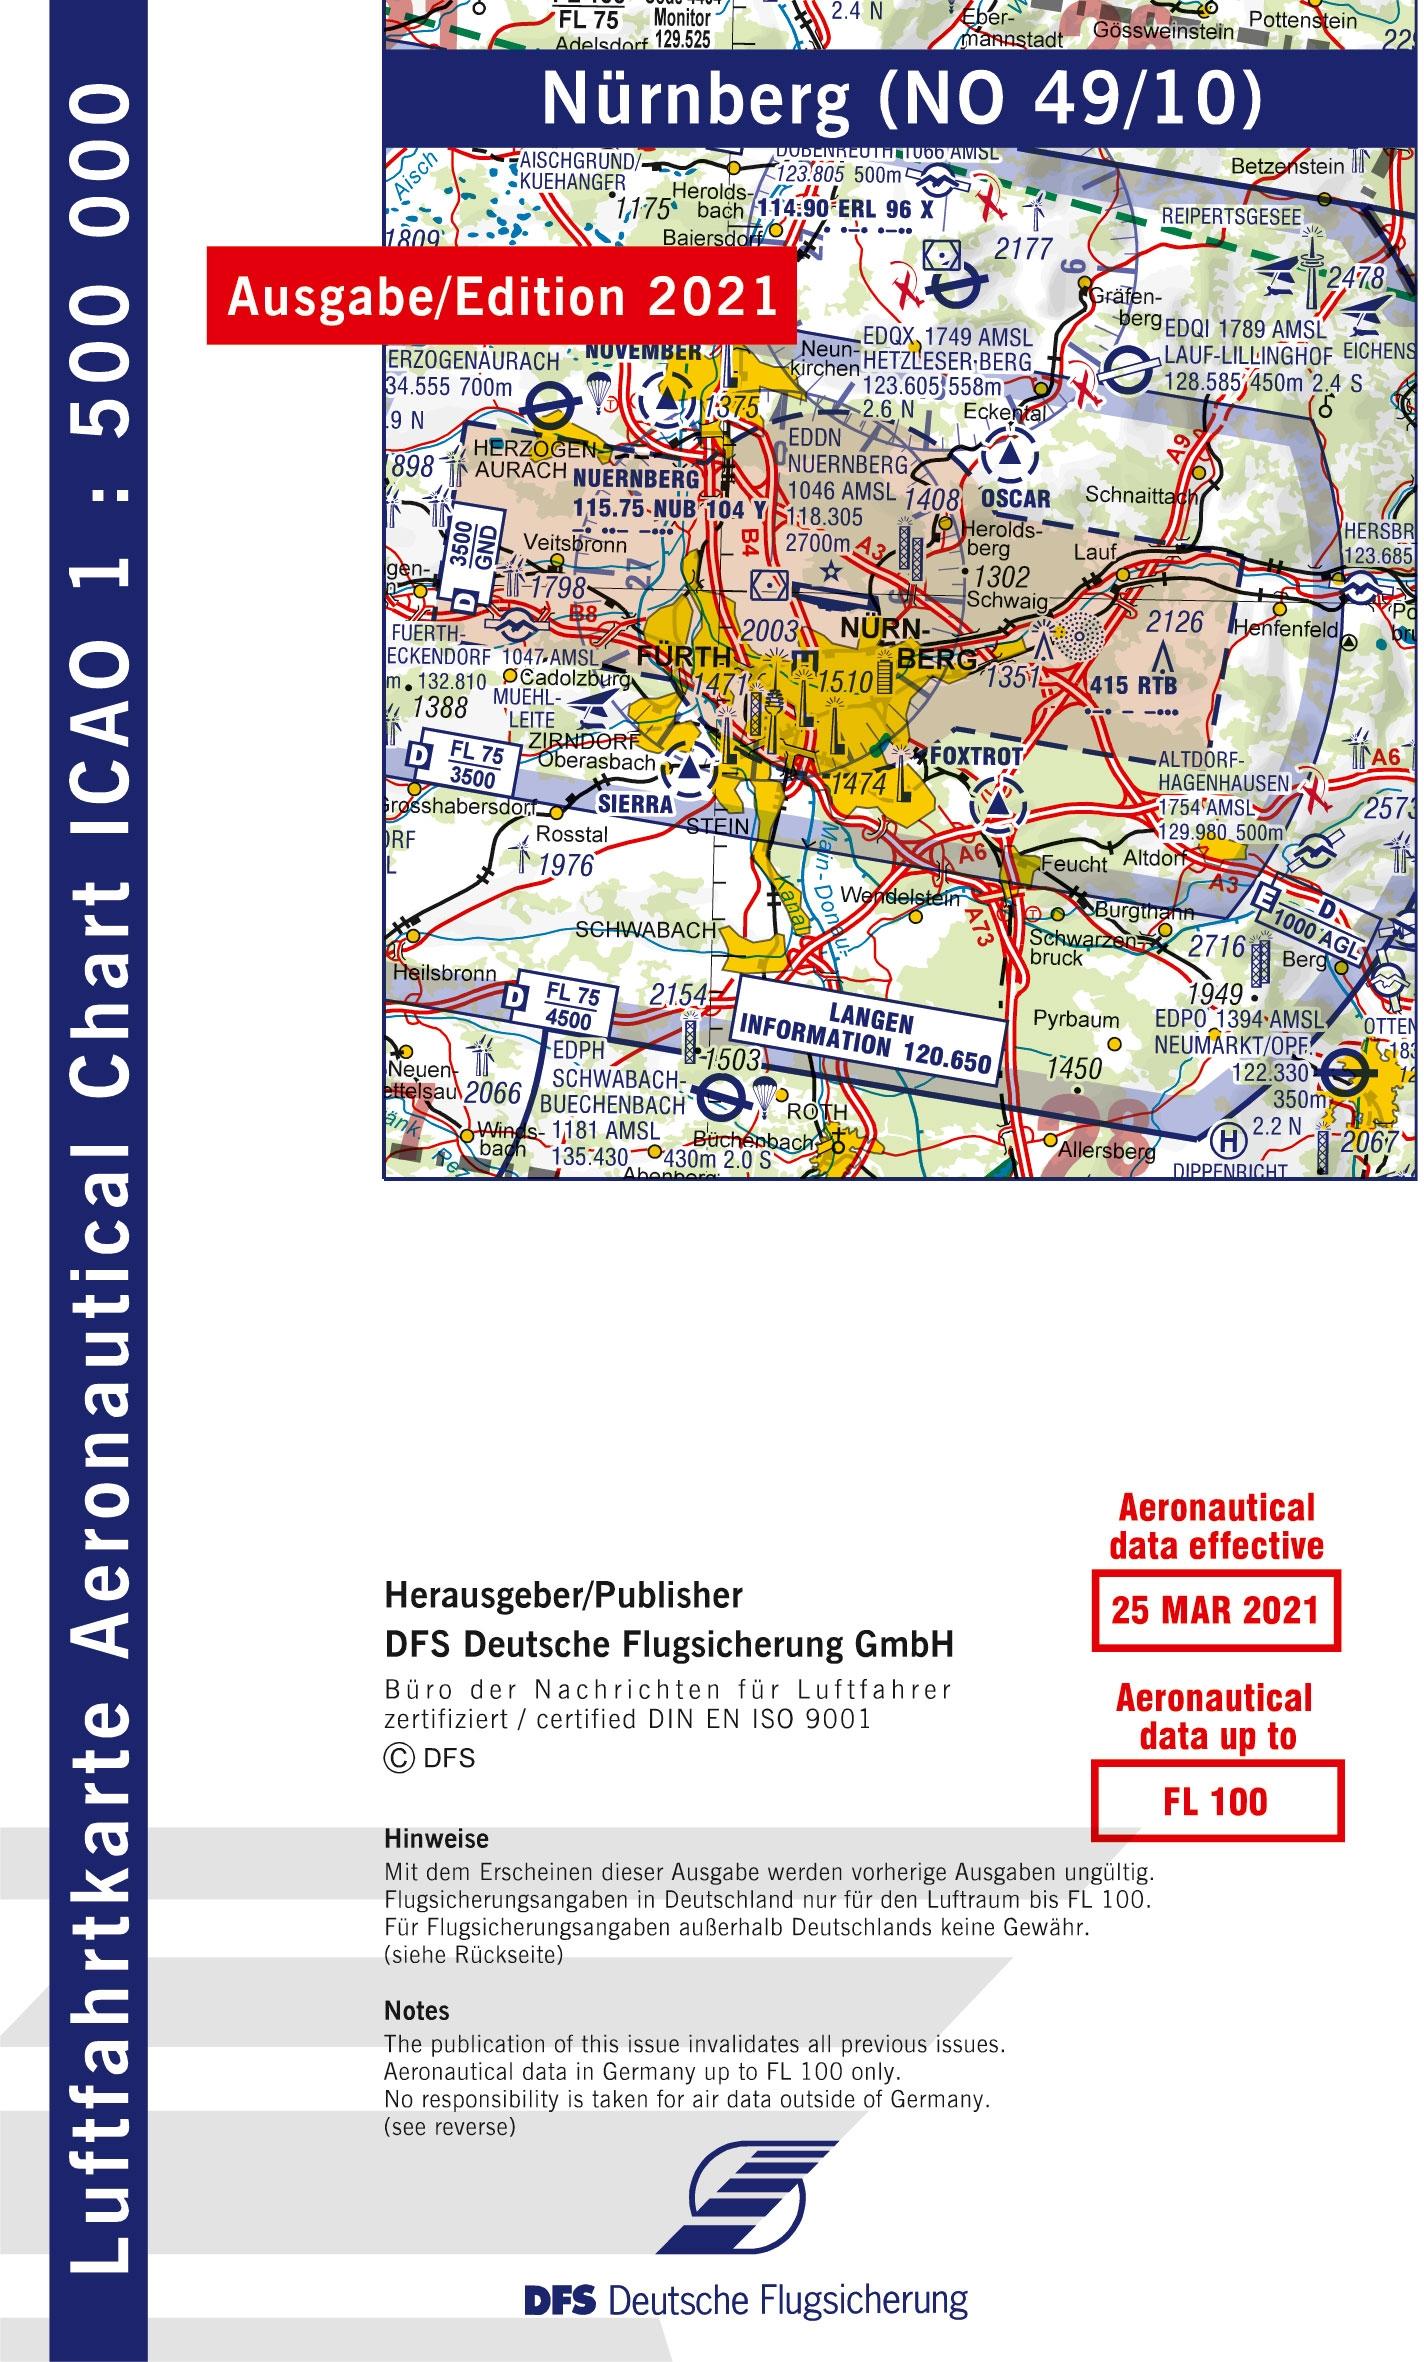 Friebe Luftfahrt Bedarf Gps Headsets Funk Ausrstung Fr Piloten Garmin 196 Wiring Diagram Icao Chart Nuremberg